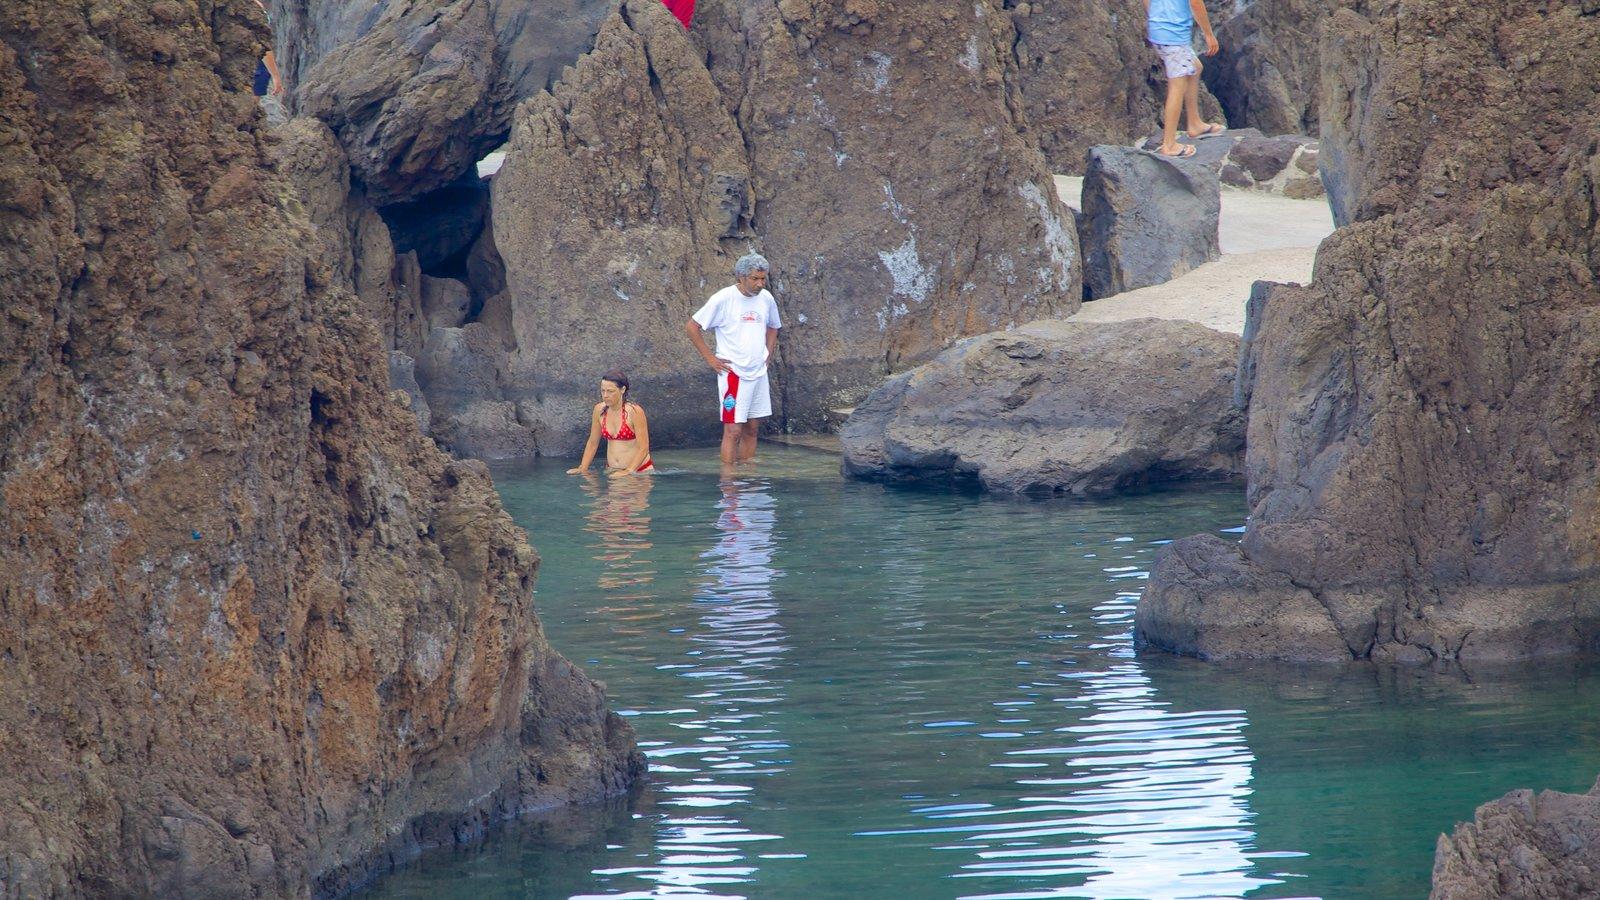 Fotos de piscinas naturales de porto moniz ver fotos e for Portugal piscinas naturales